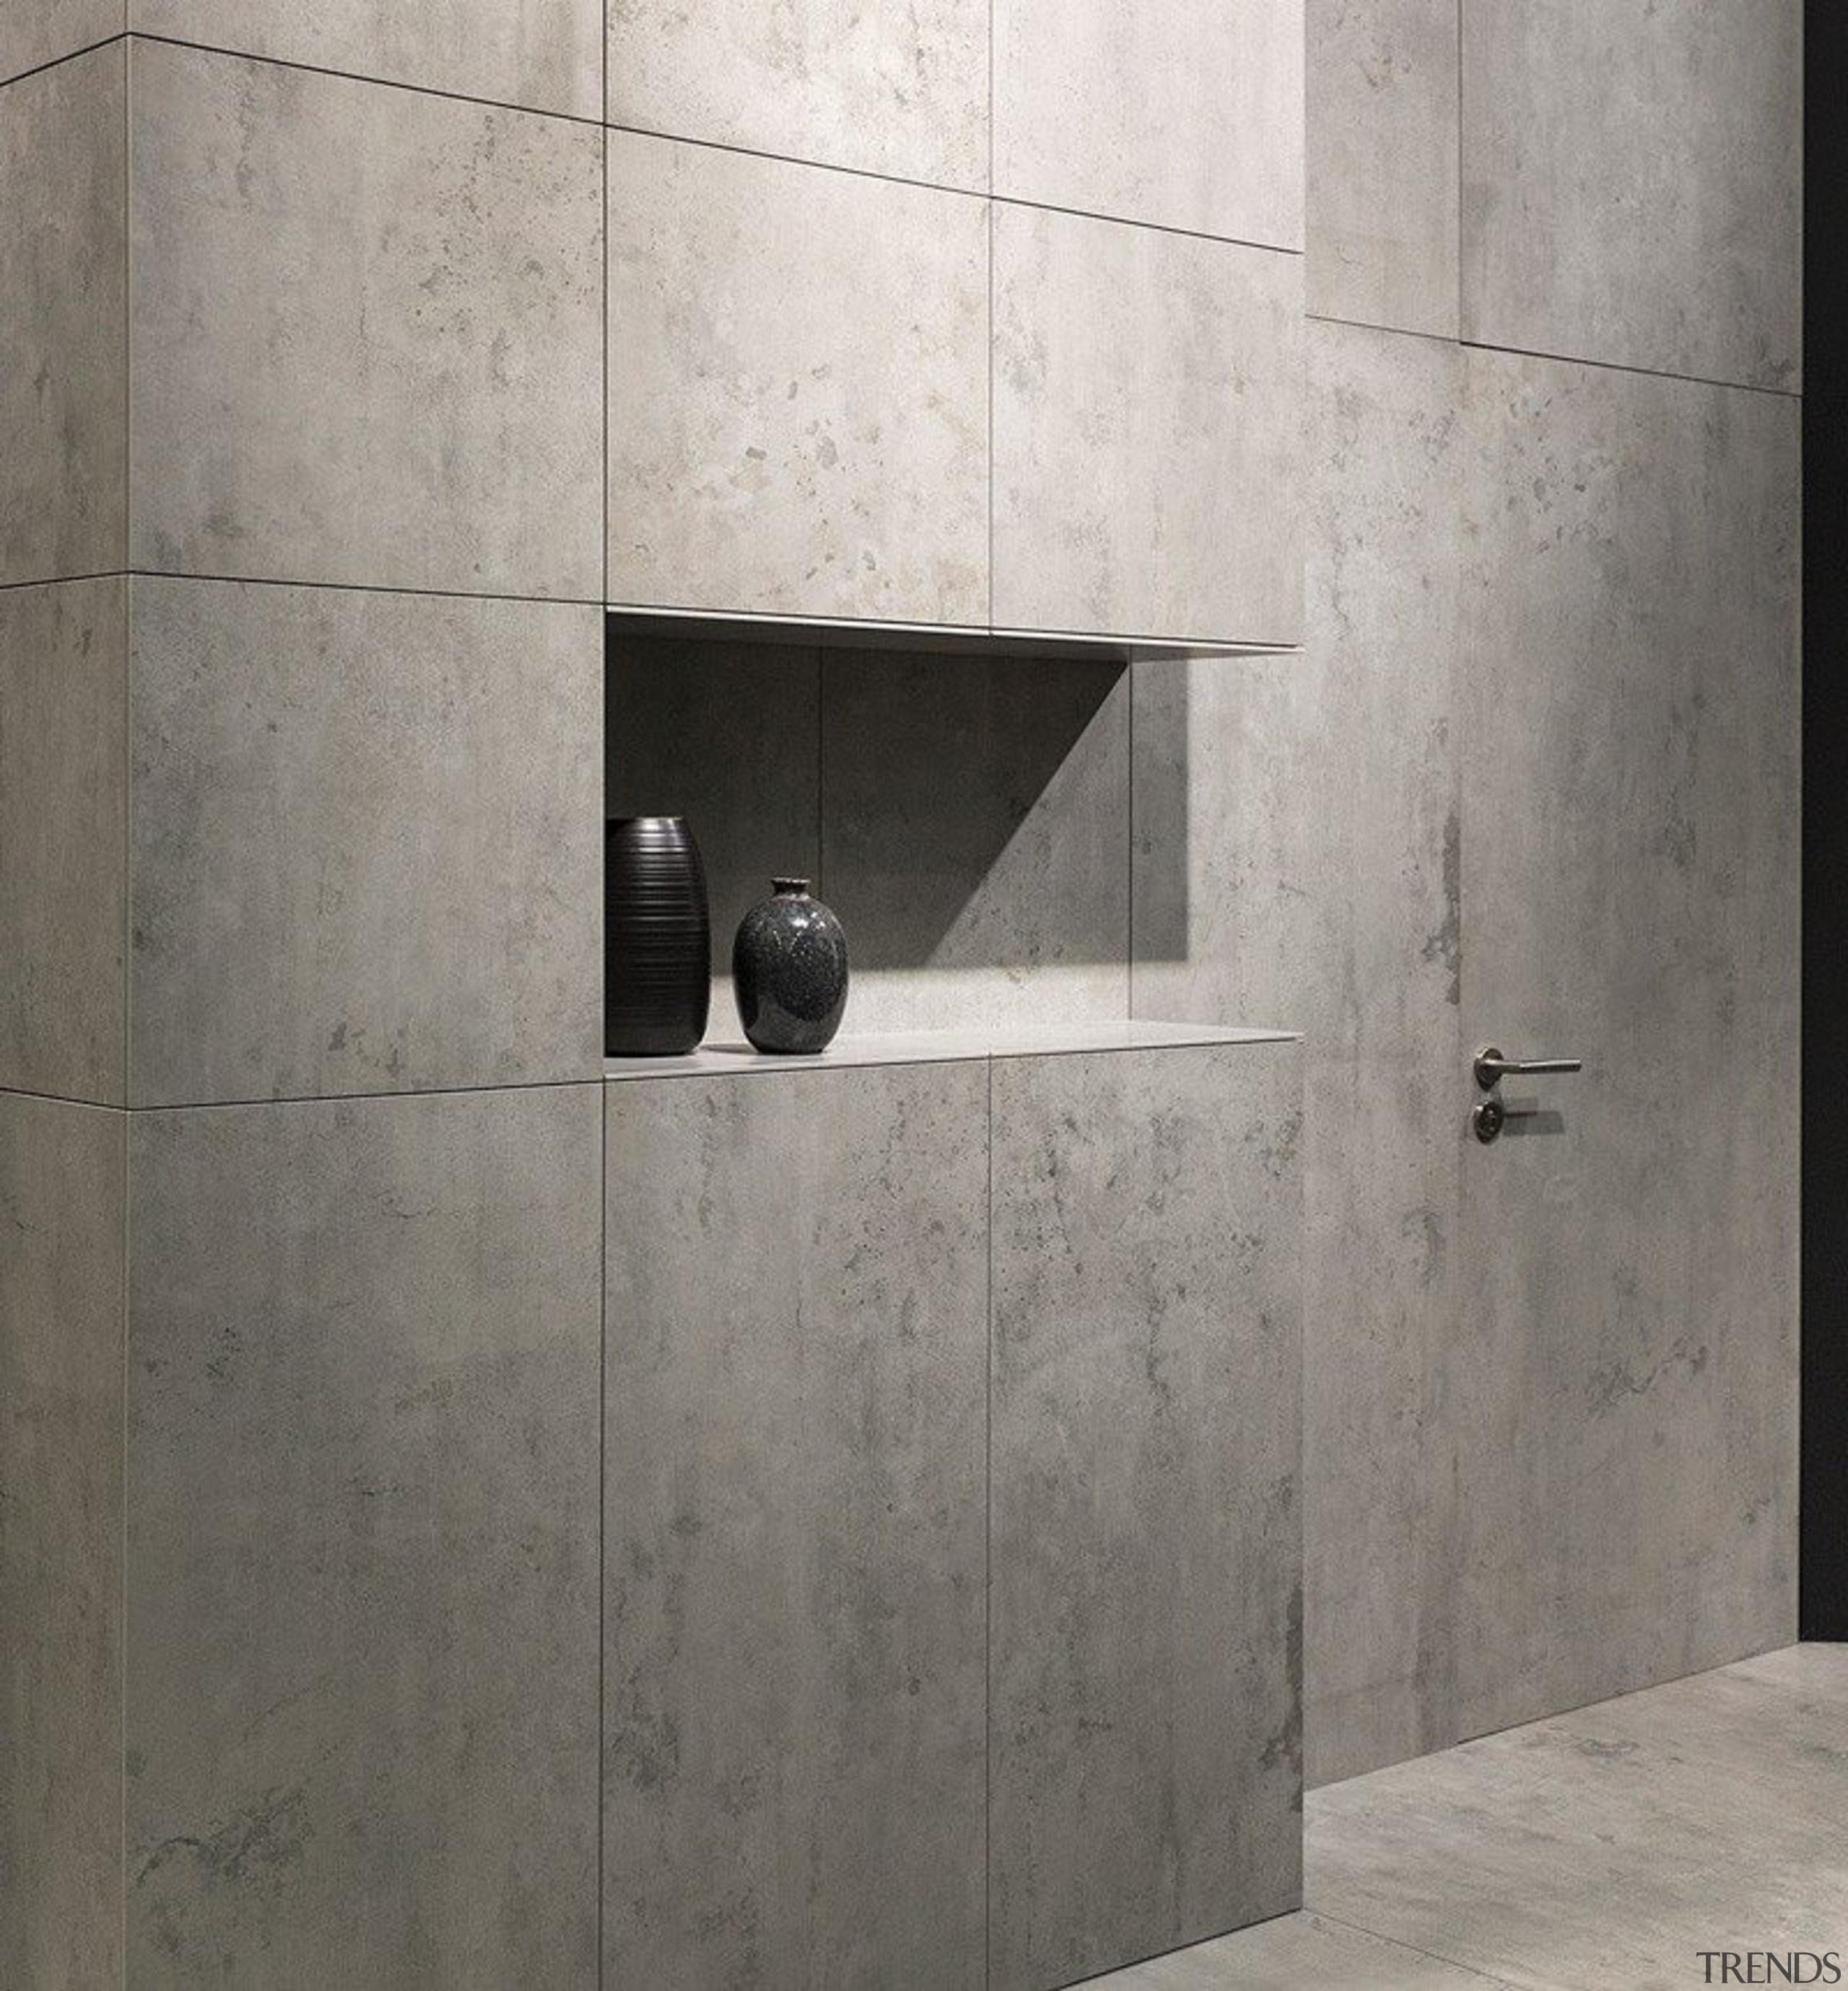 Beton - internal wall installation - Beton - architecture, concrete, floor, plumbing fixture, product design, tap, tile, wall, gray